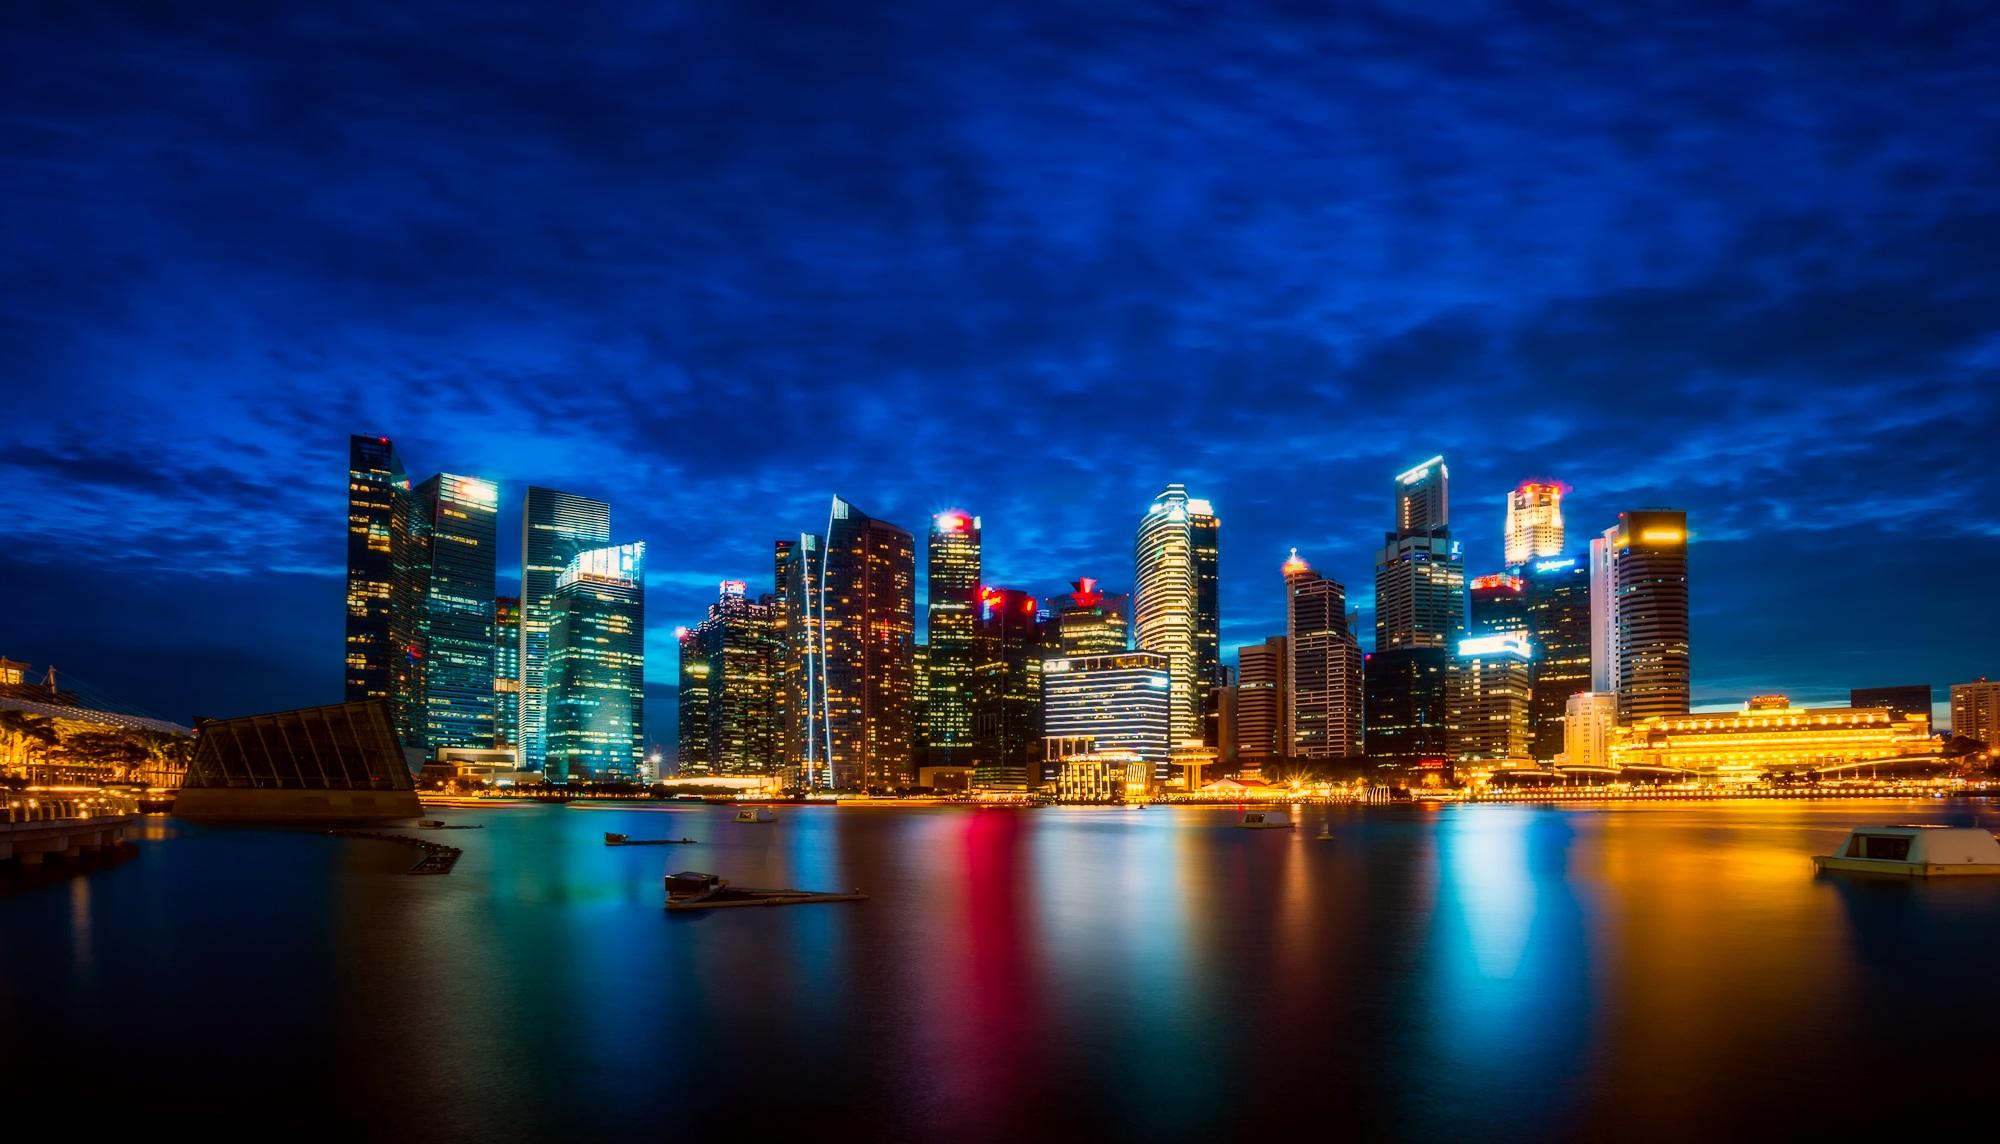 HITB GSEC – Singapore 2019